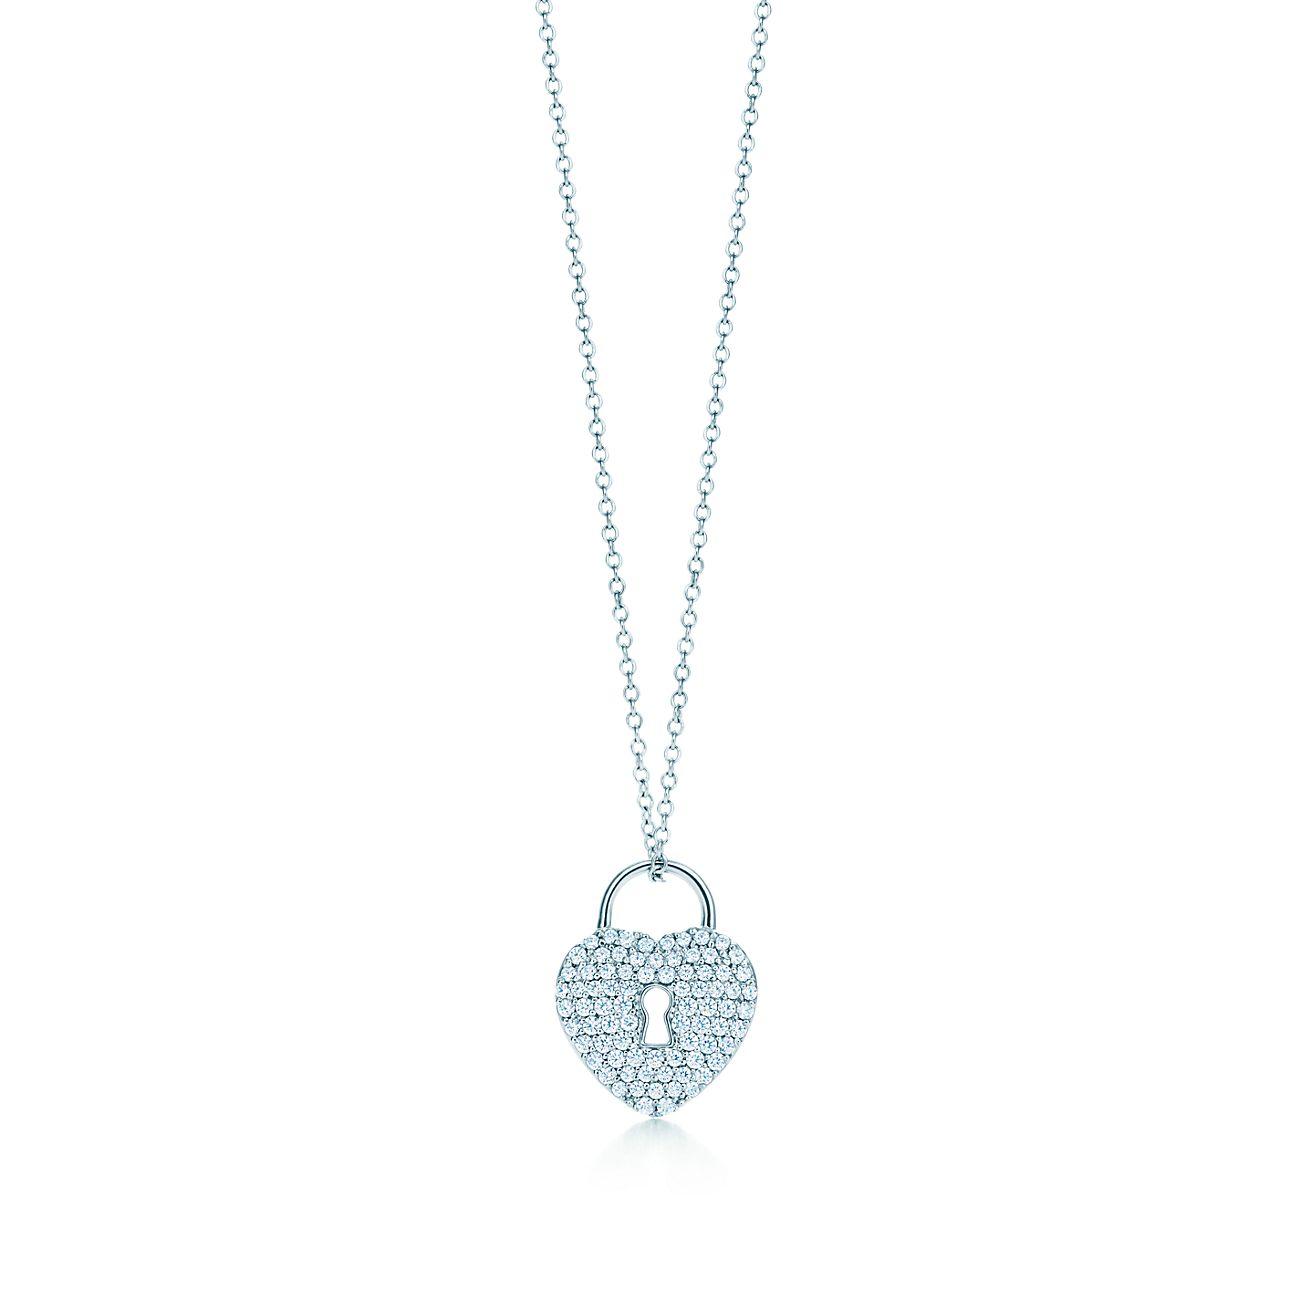 Tiffany locks heart lock pendant in platinum with diamonds on a 16 tiffany locksheart lock pendant aloadofball Gallery